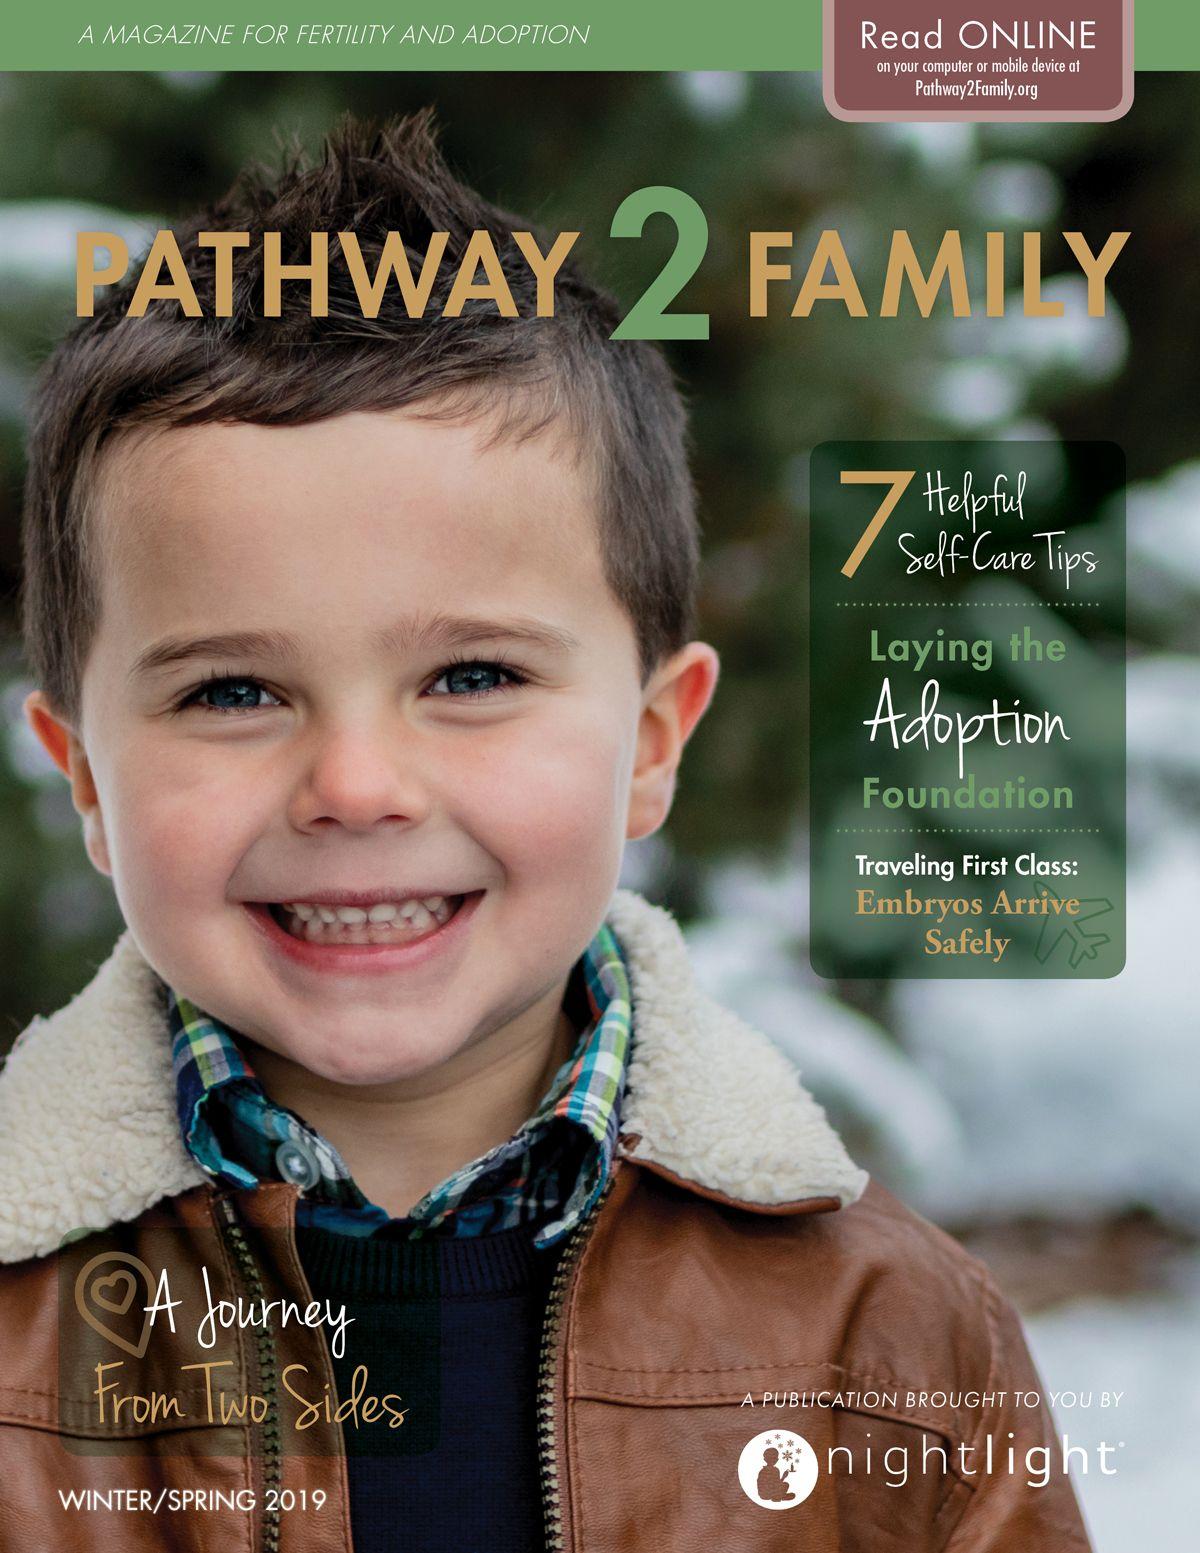 Pathway2Family Adoption awareness, Embryo adoption, Adoption